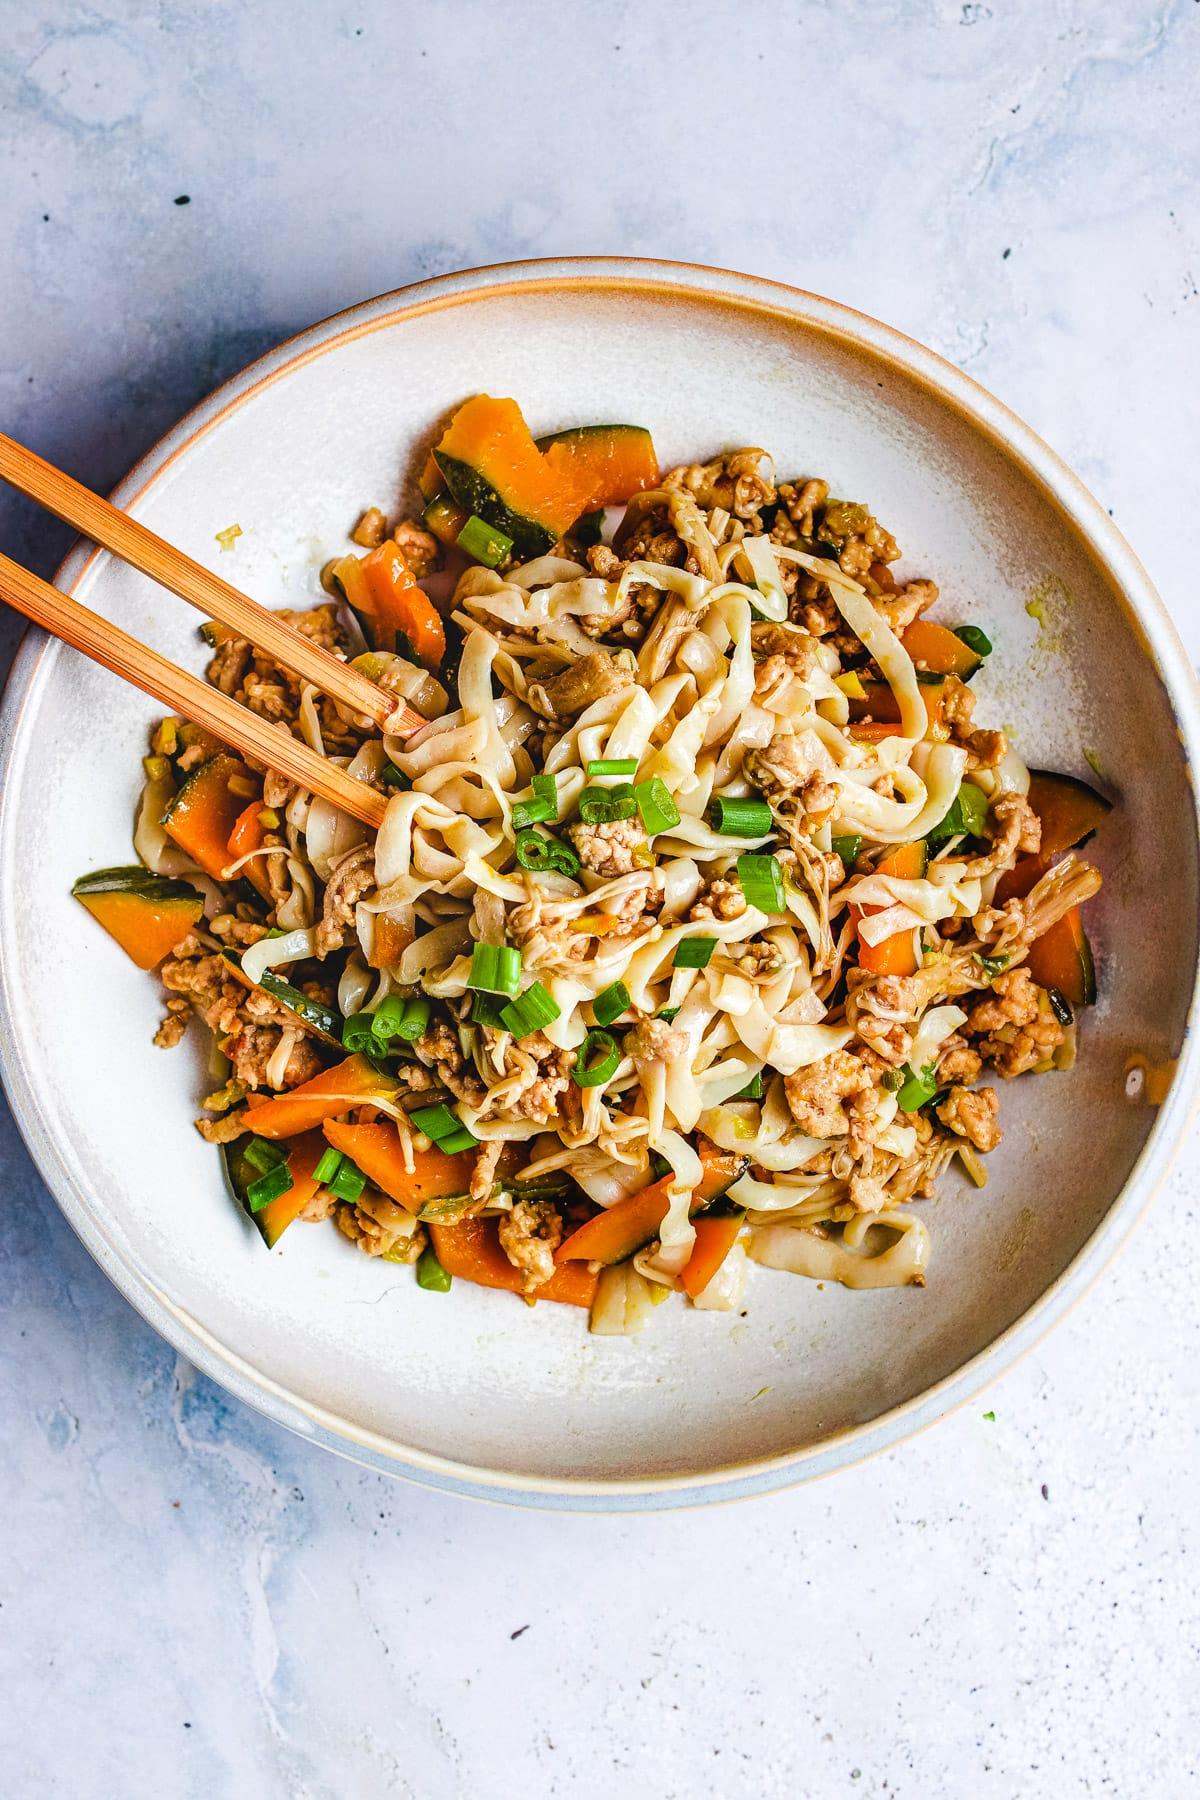 Kabocha Squash Noodle Stir Fry I Heart Umami